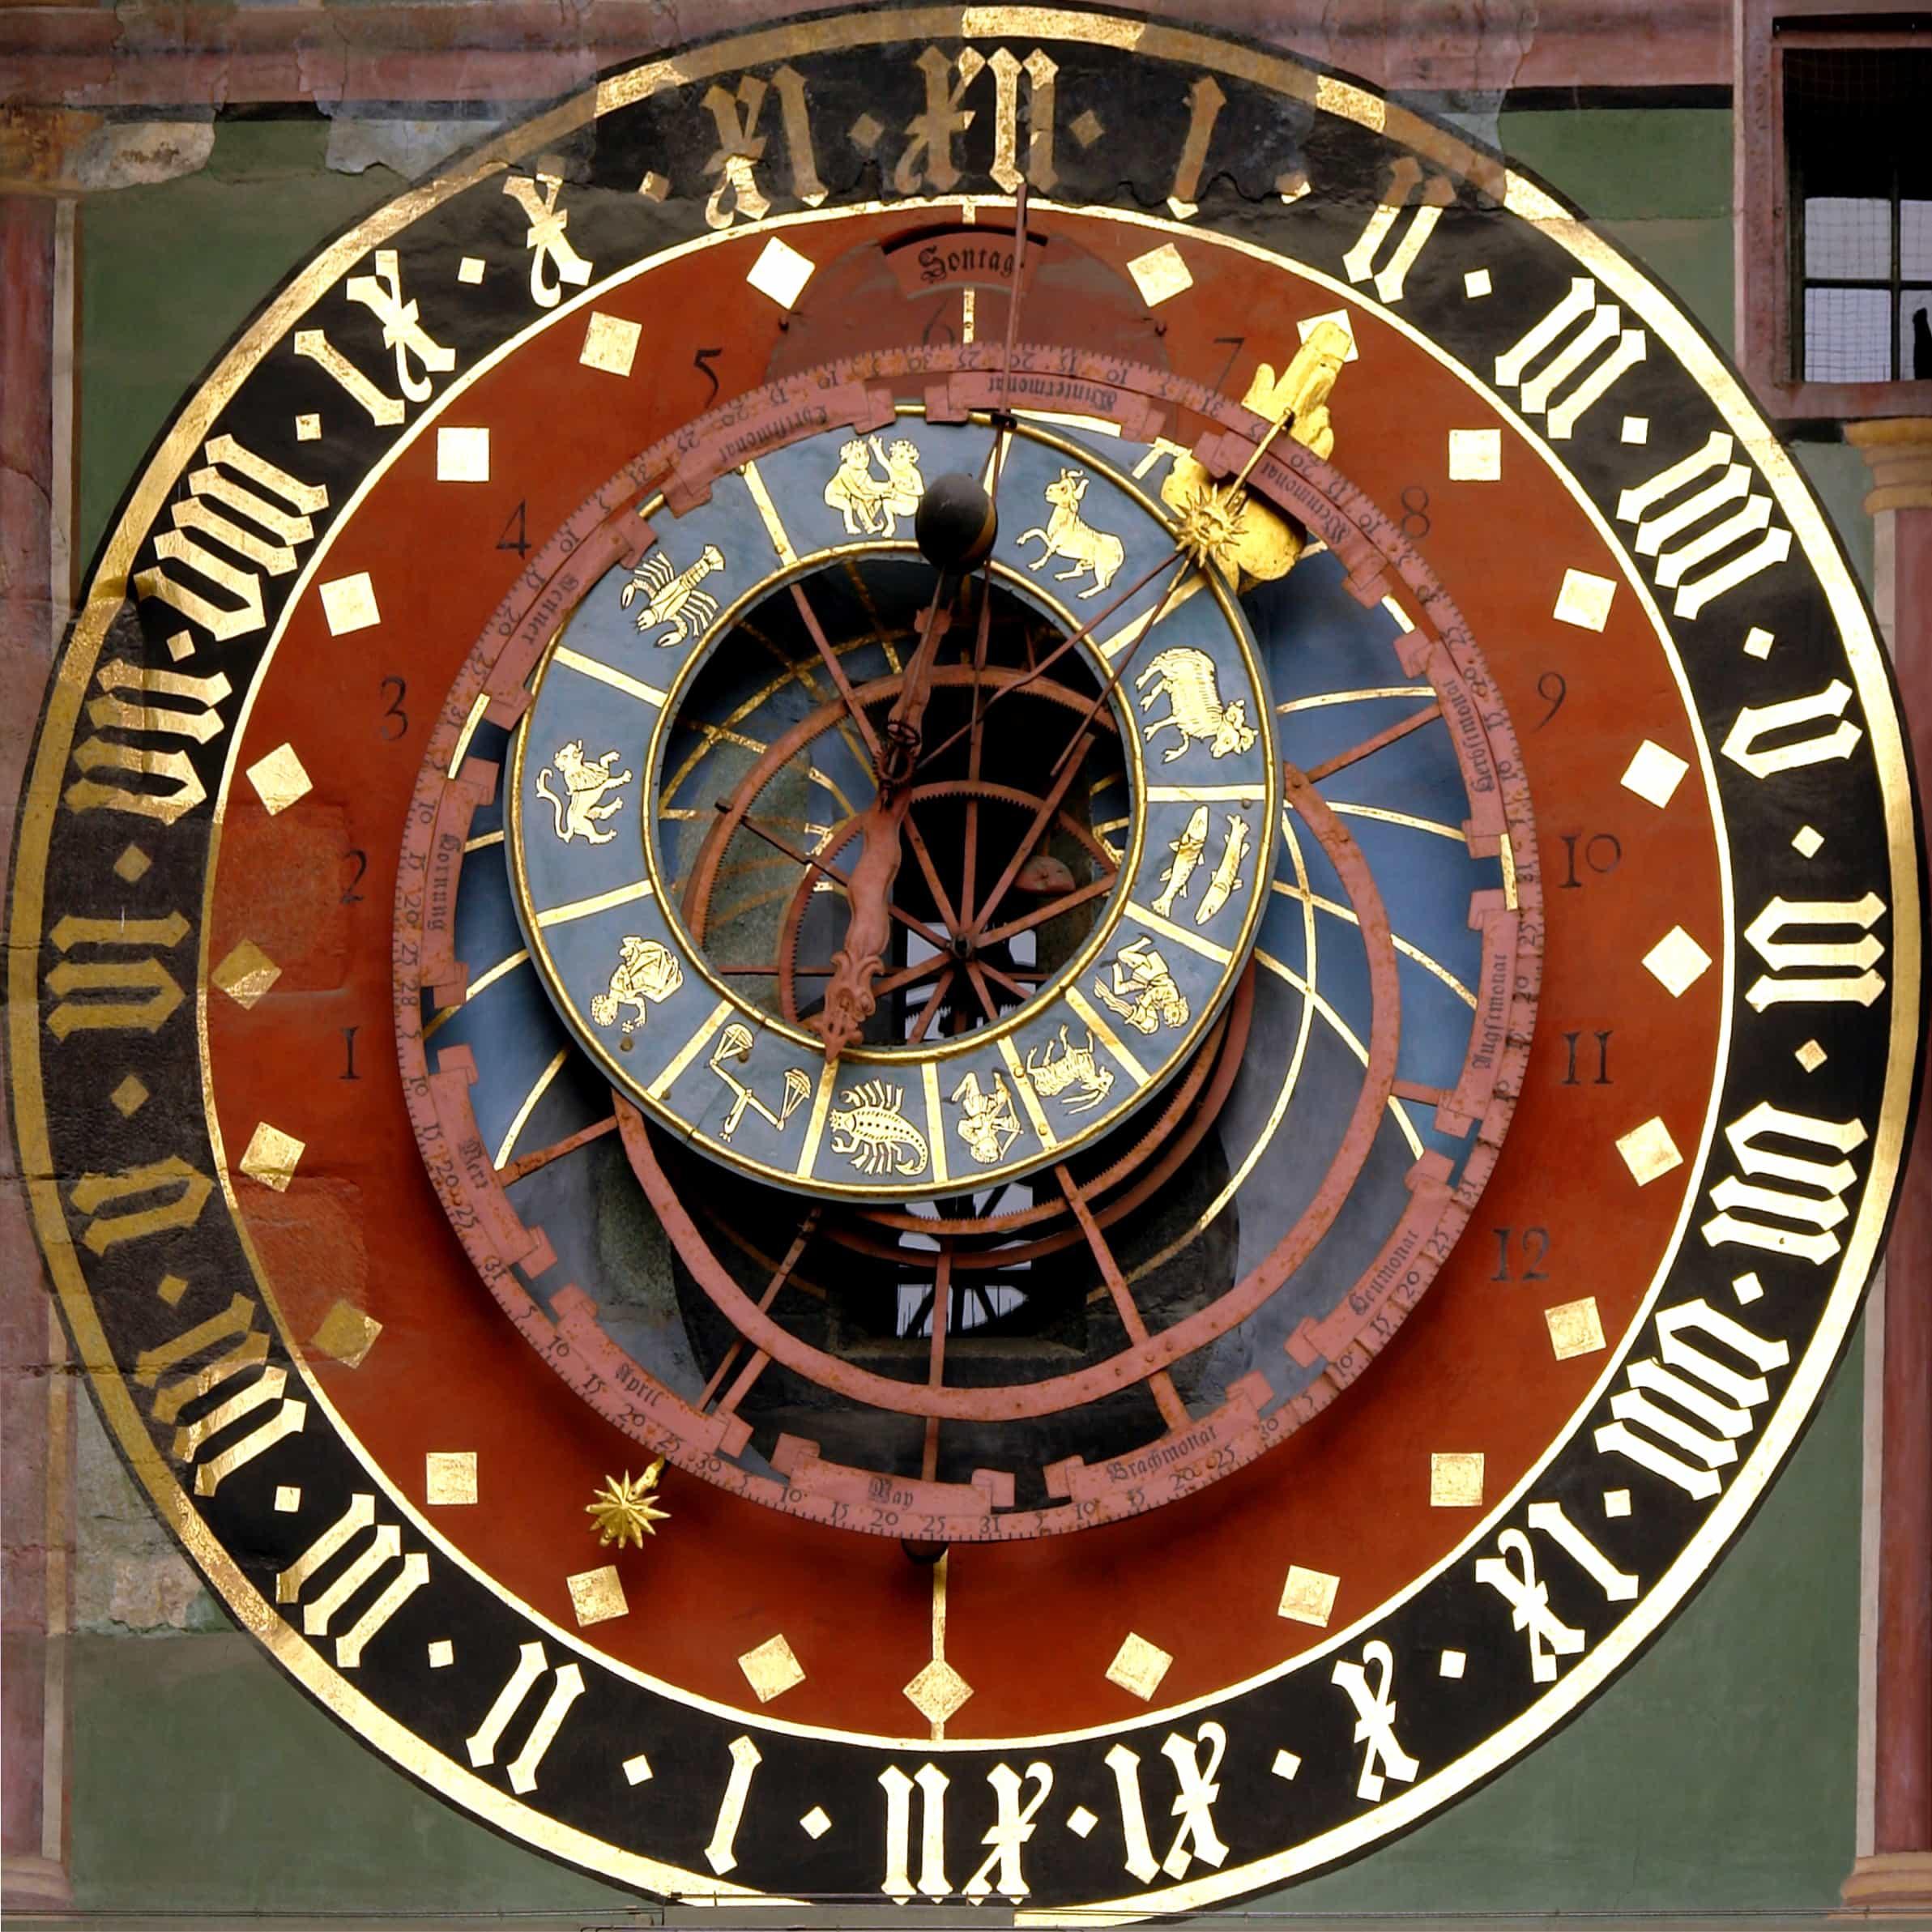 zytglogge-bern-astronomical-clock-2